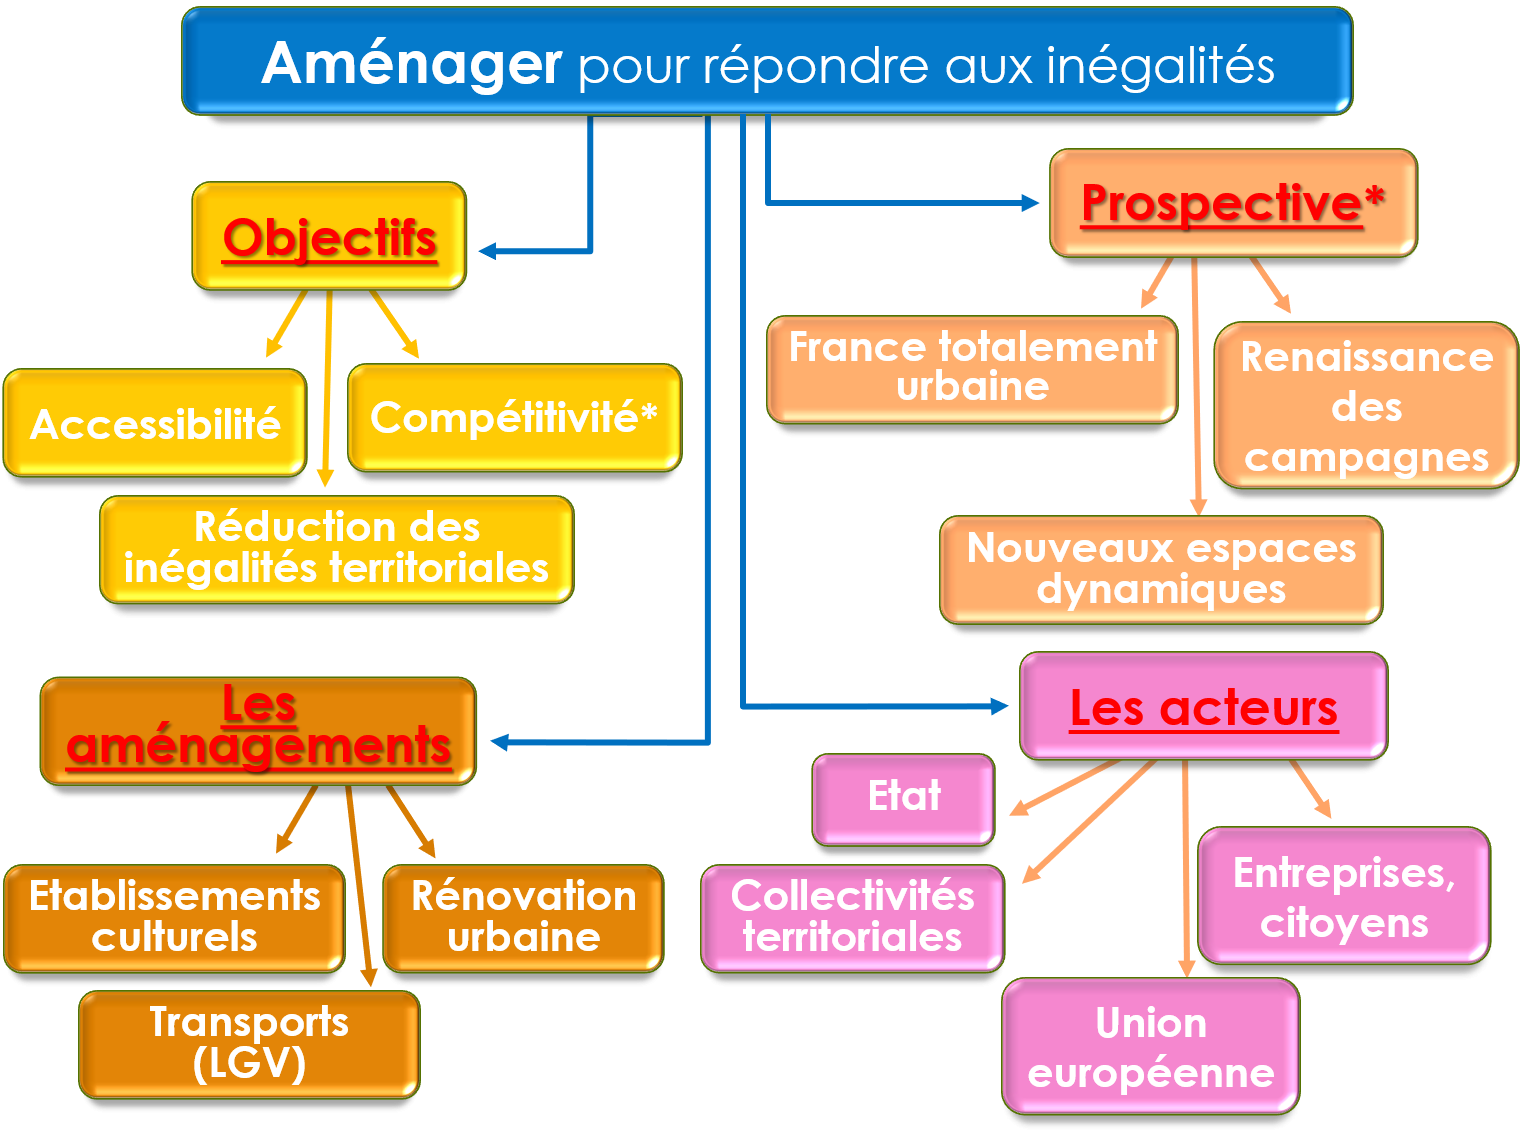 Organigramme amenager